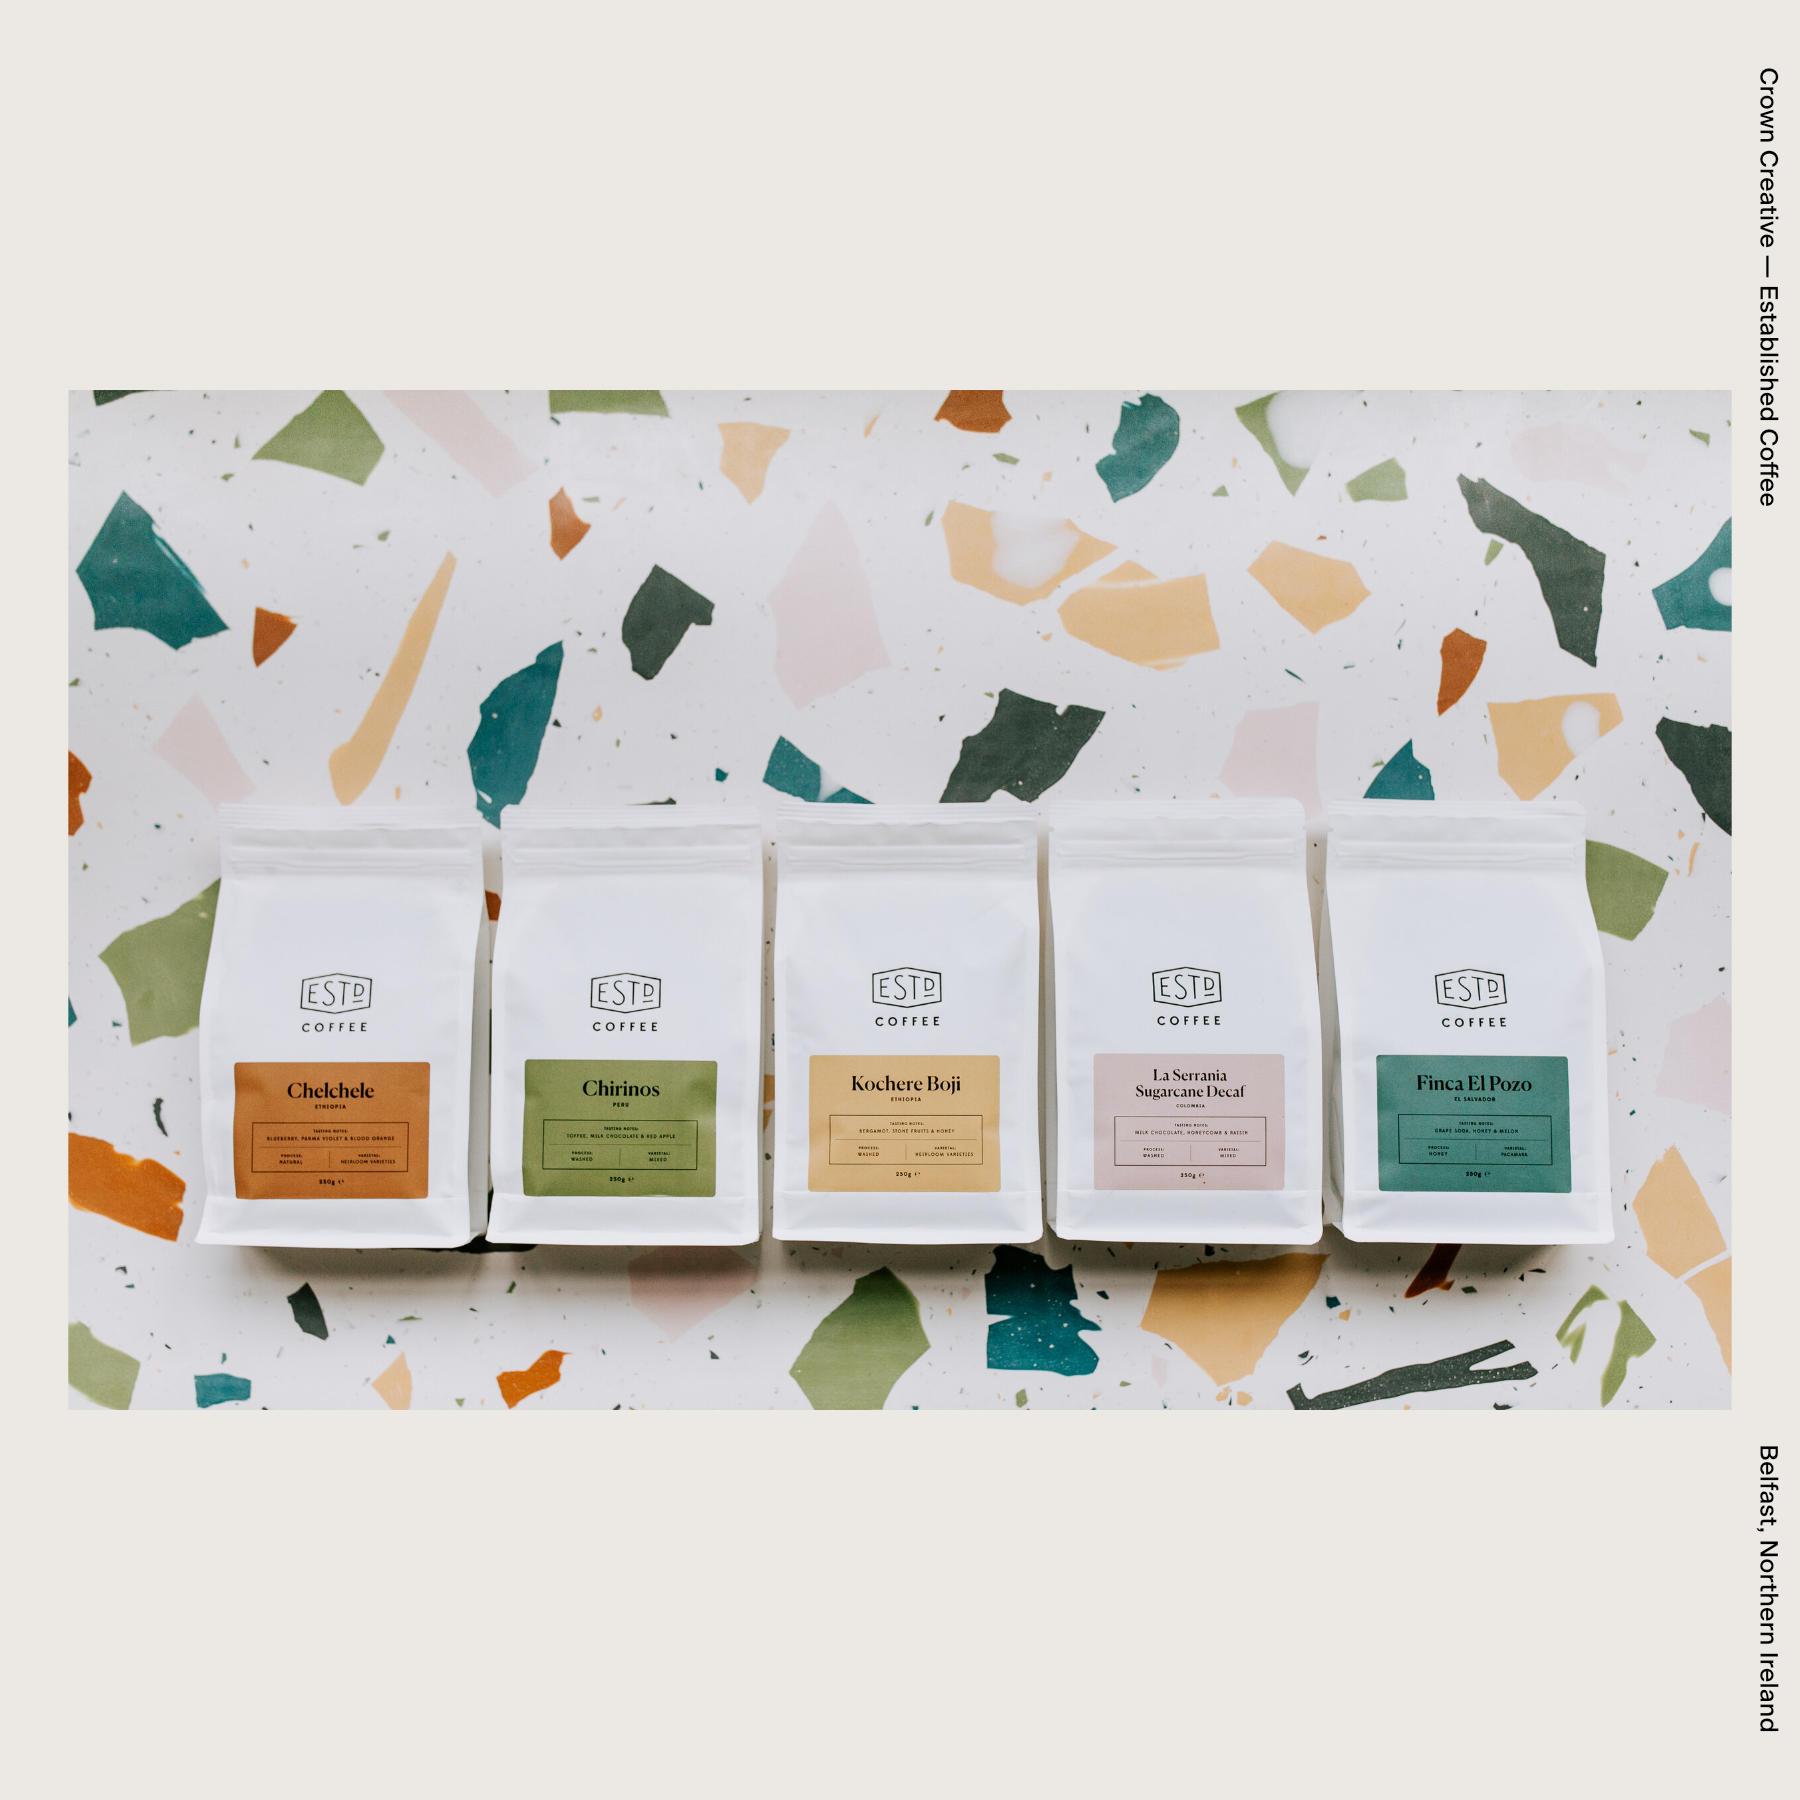 Crown Creative — Established Coffee